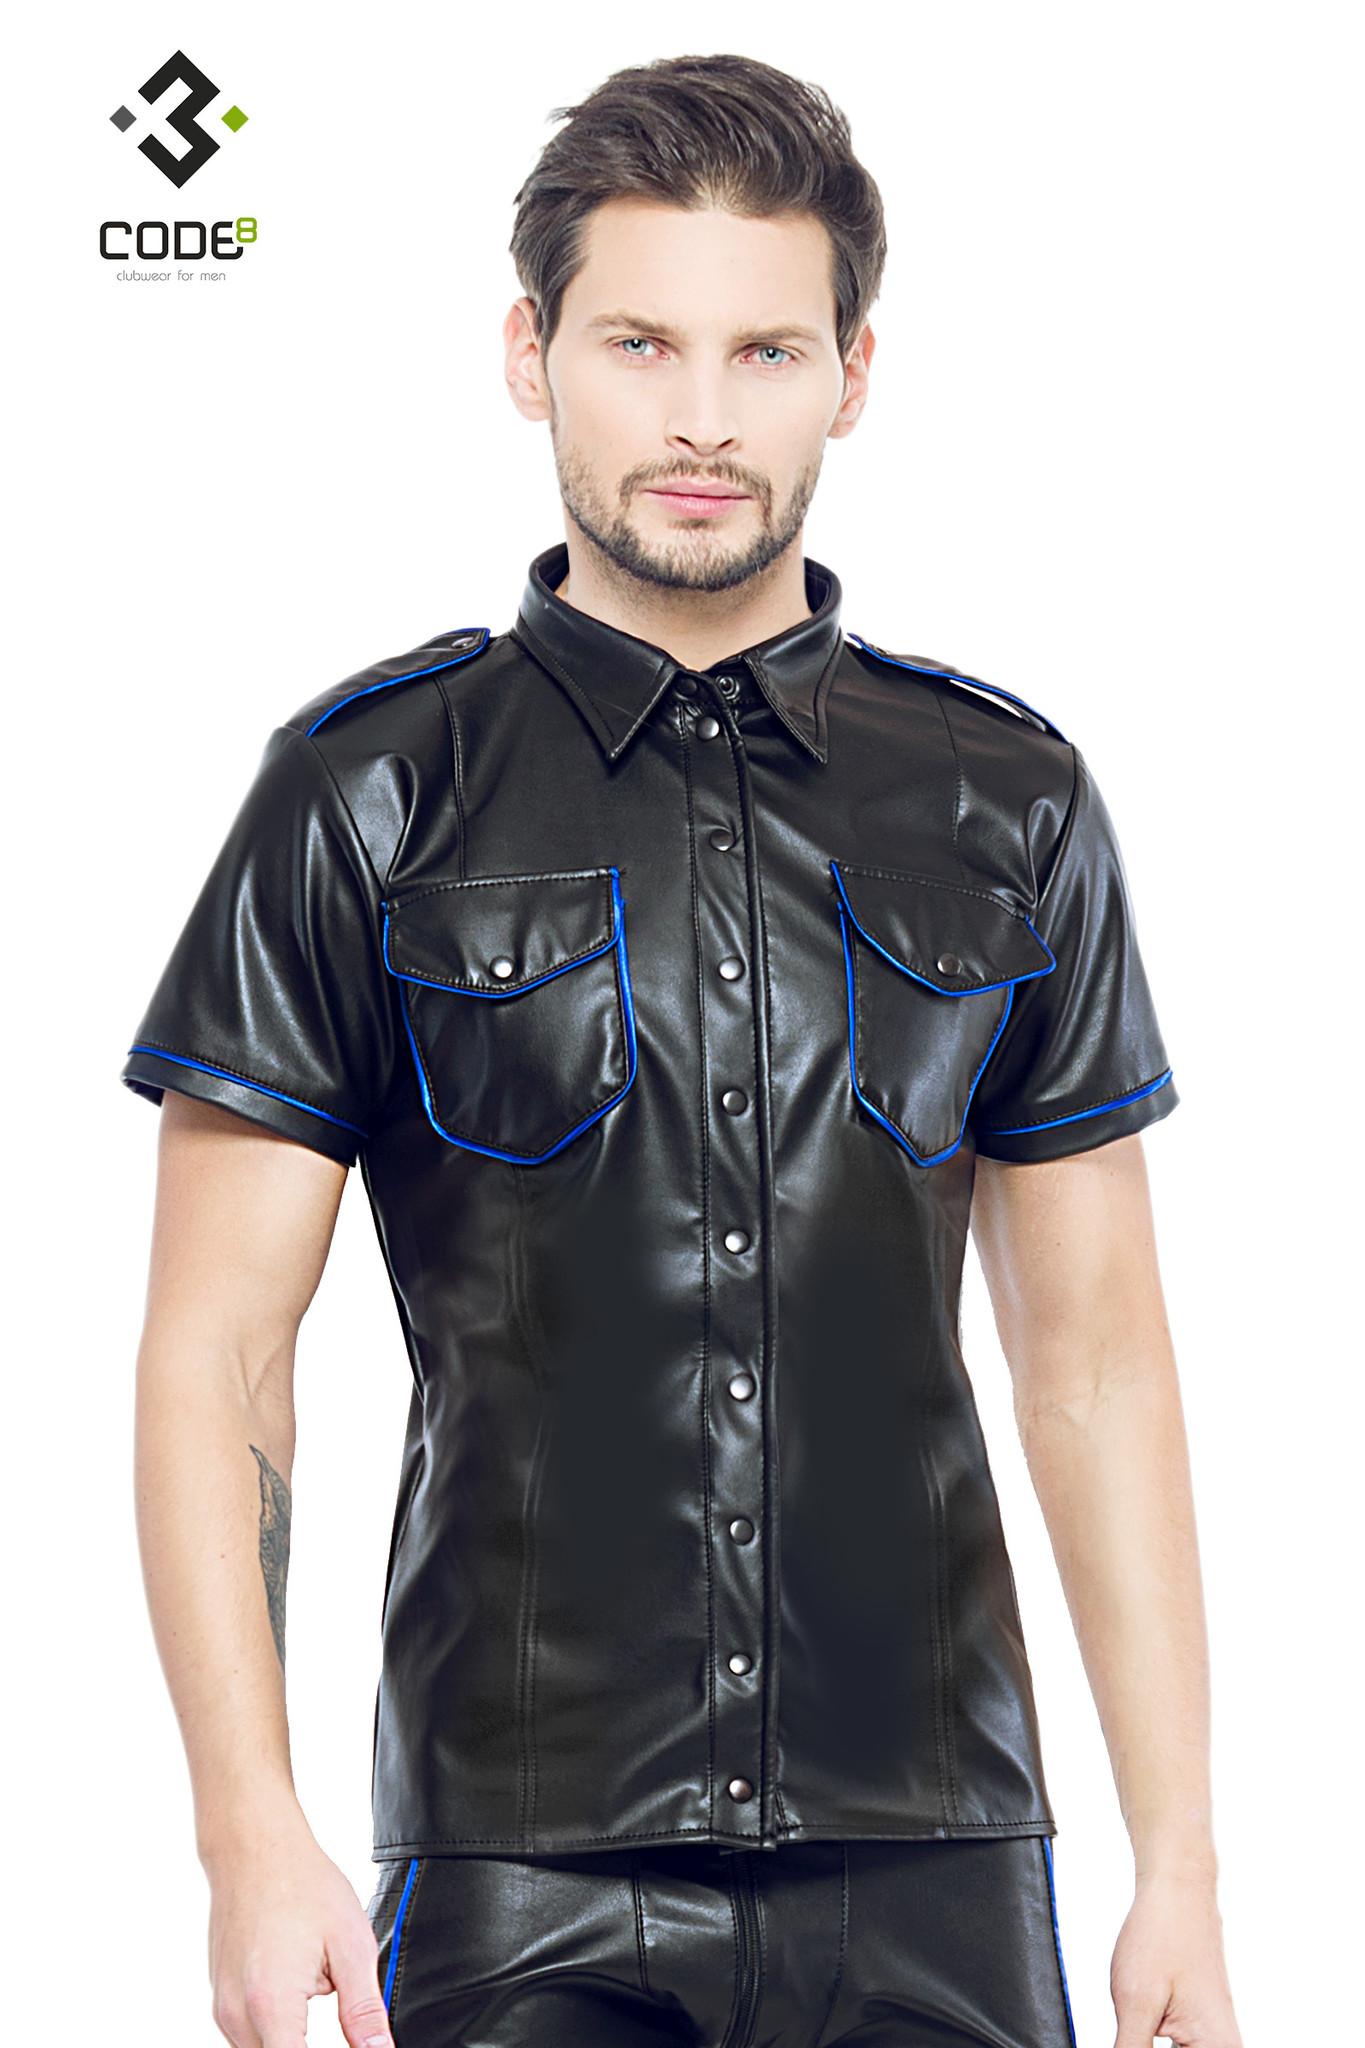 Code8 by XXX COLLECTION Shirt van hoge kwaliteit PU-Leer